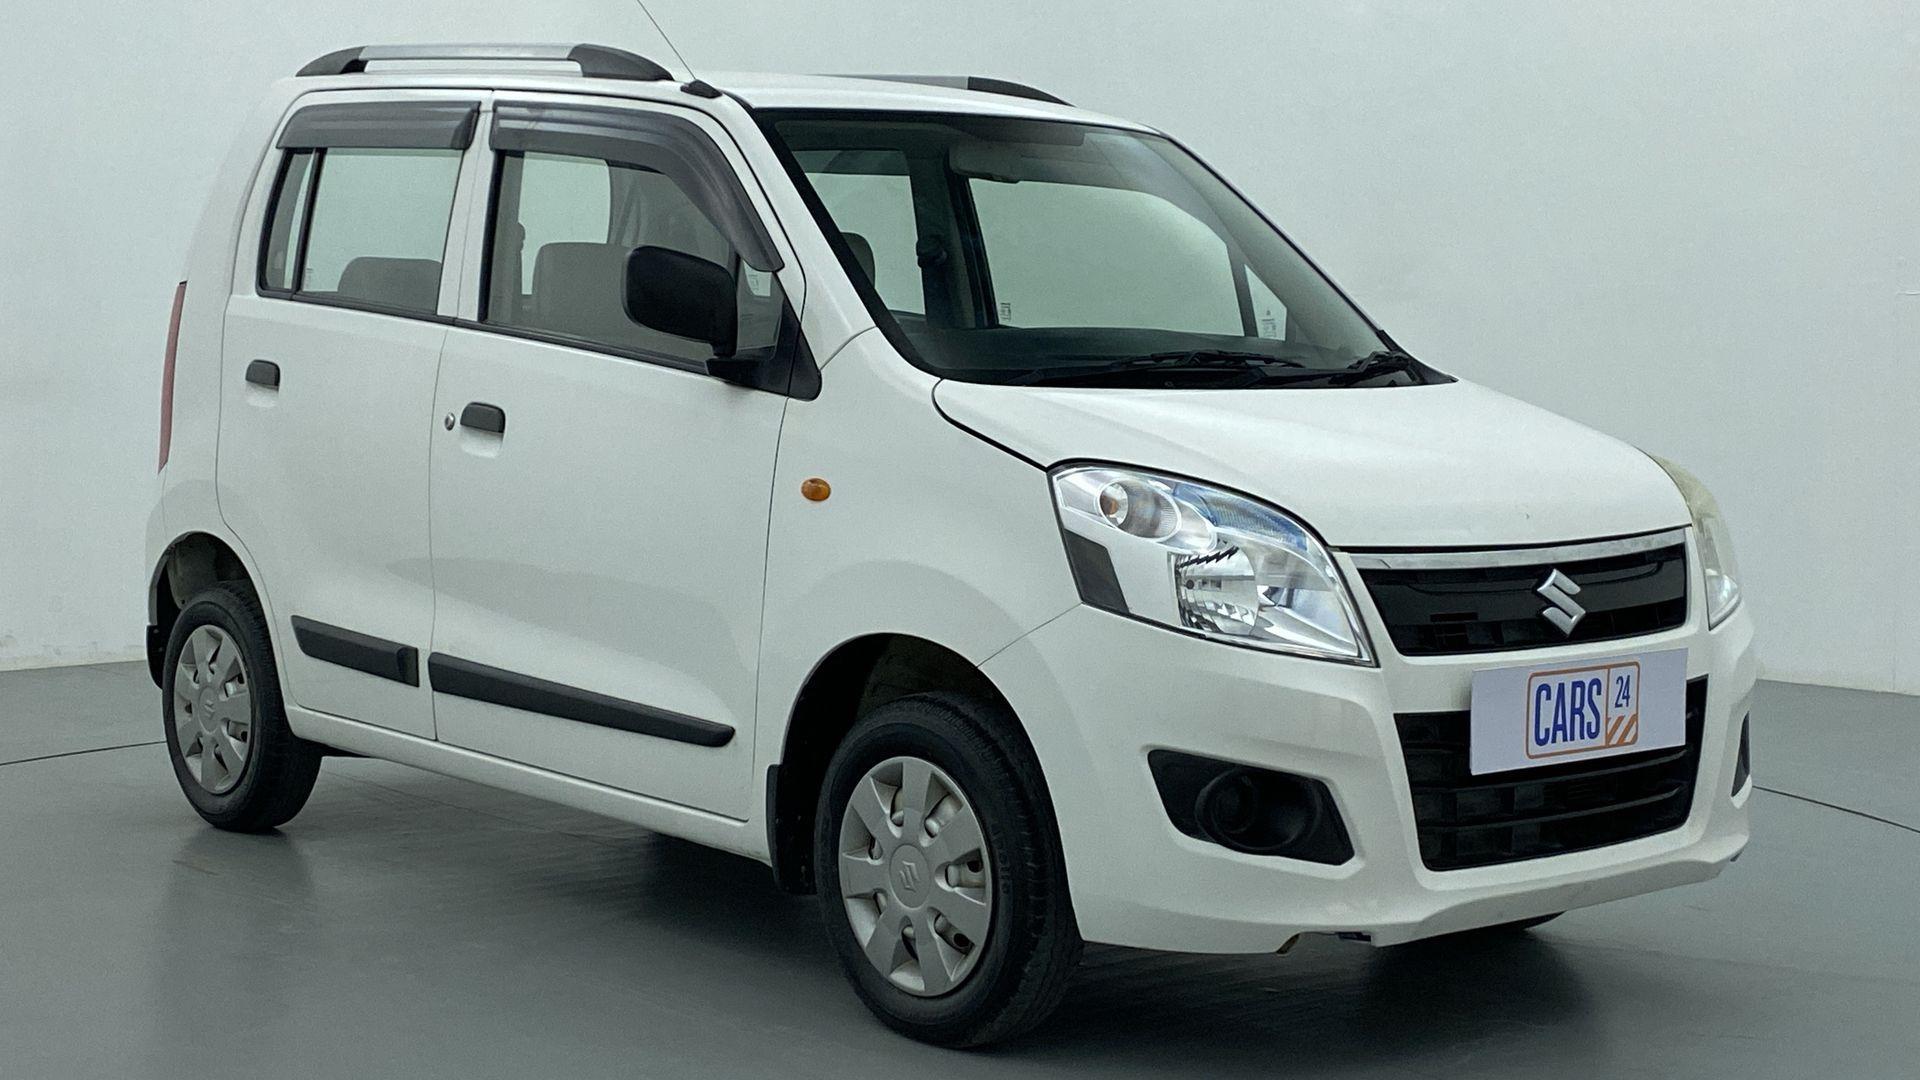 2018 Maruti Wagon R 1.0 LXI